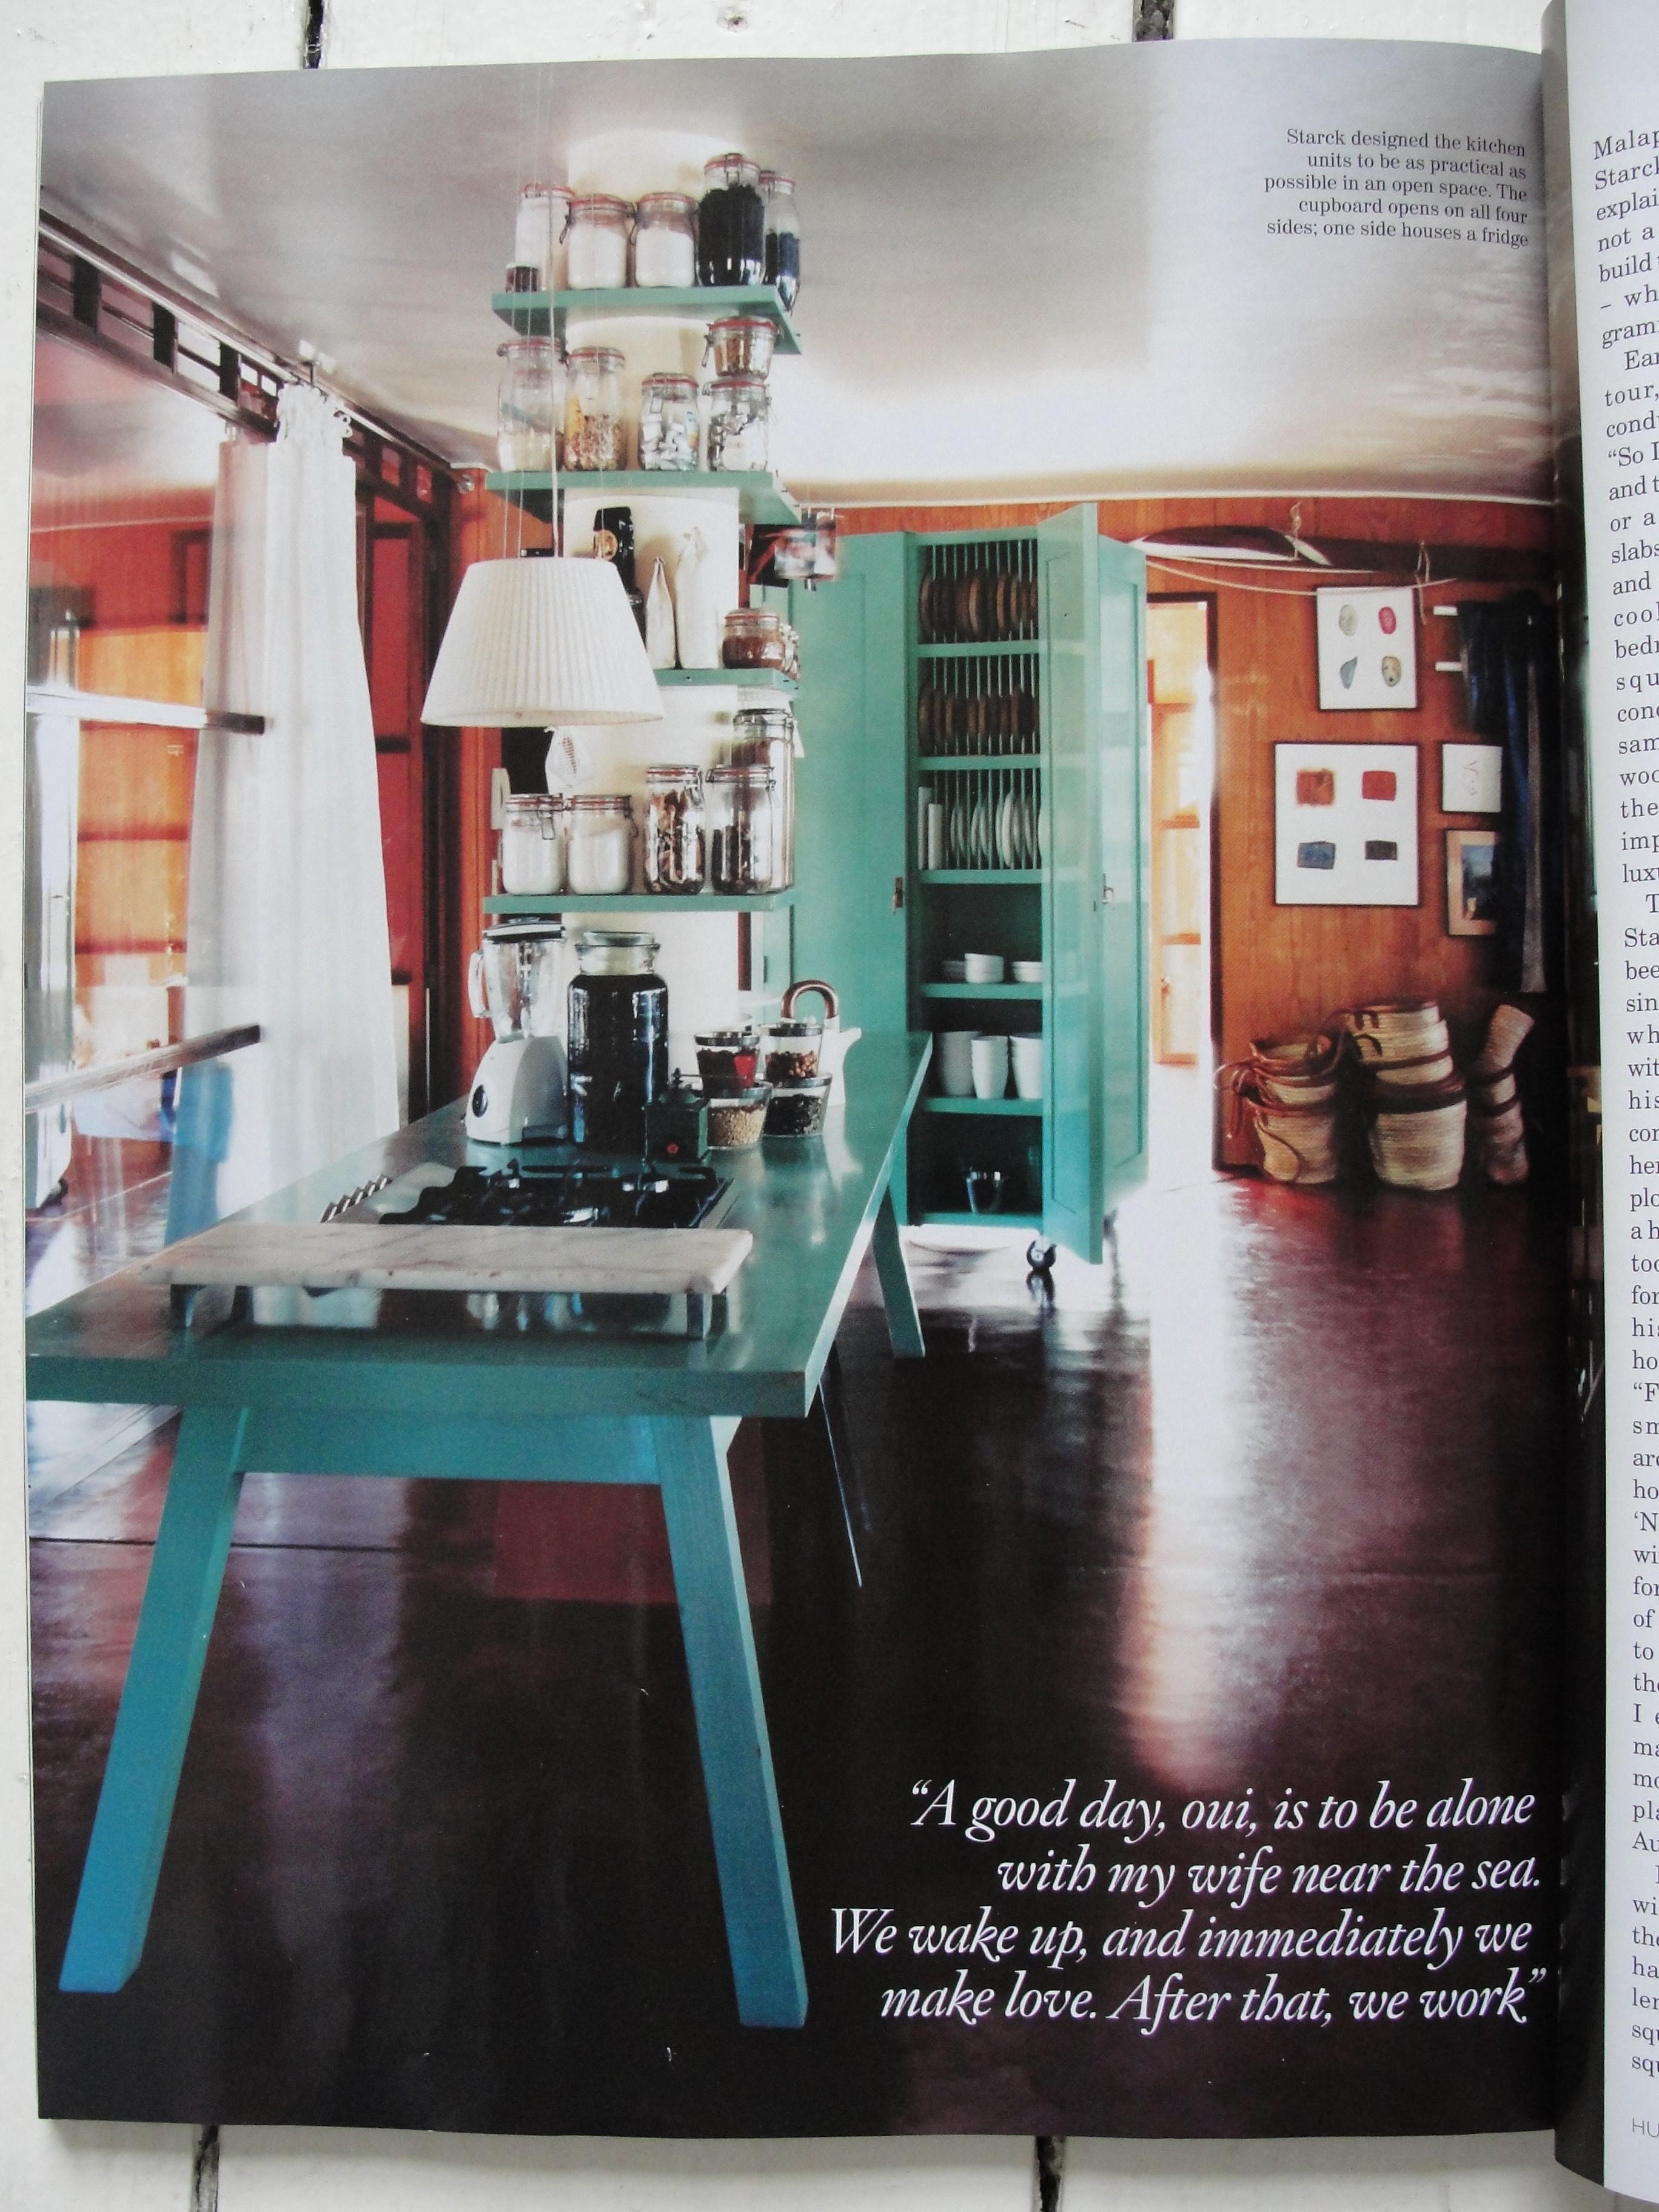 philippe starcks kitchen - Philippe Starck Kitchen